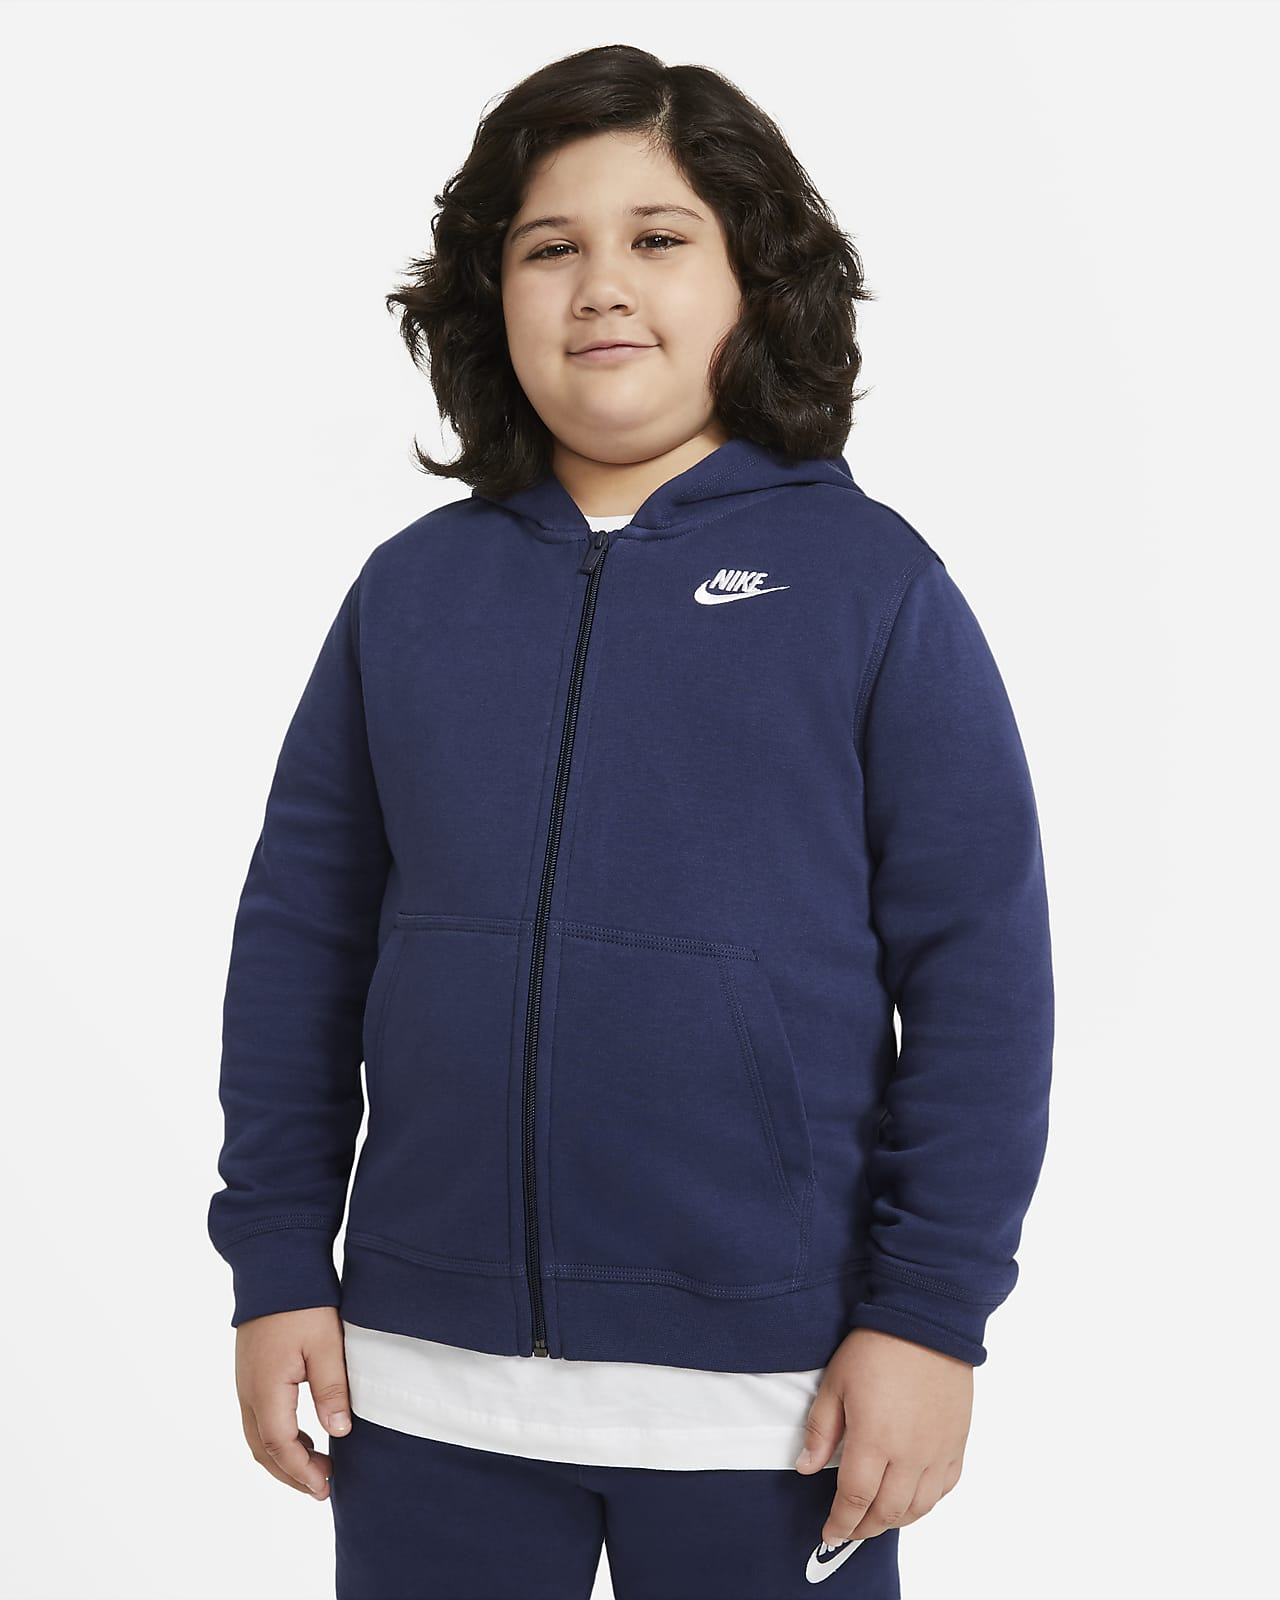 Hoodie com fecho completo Nike Sportswear Club Fleece Júnior (Rapaz) (tamanhos grandes)